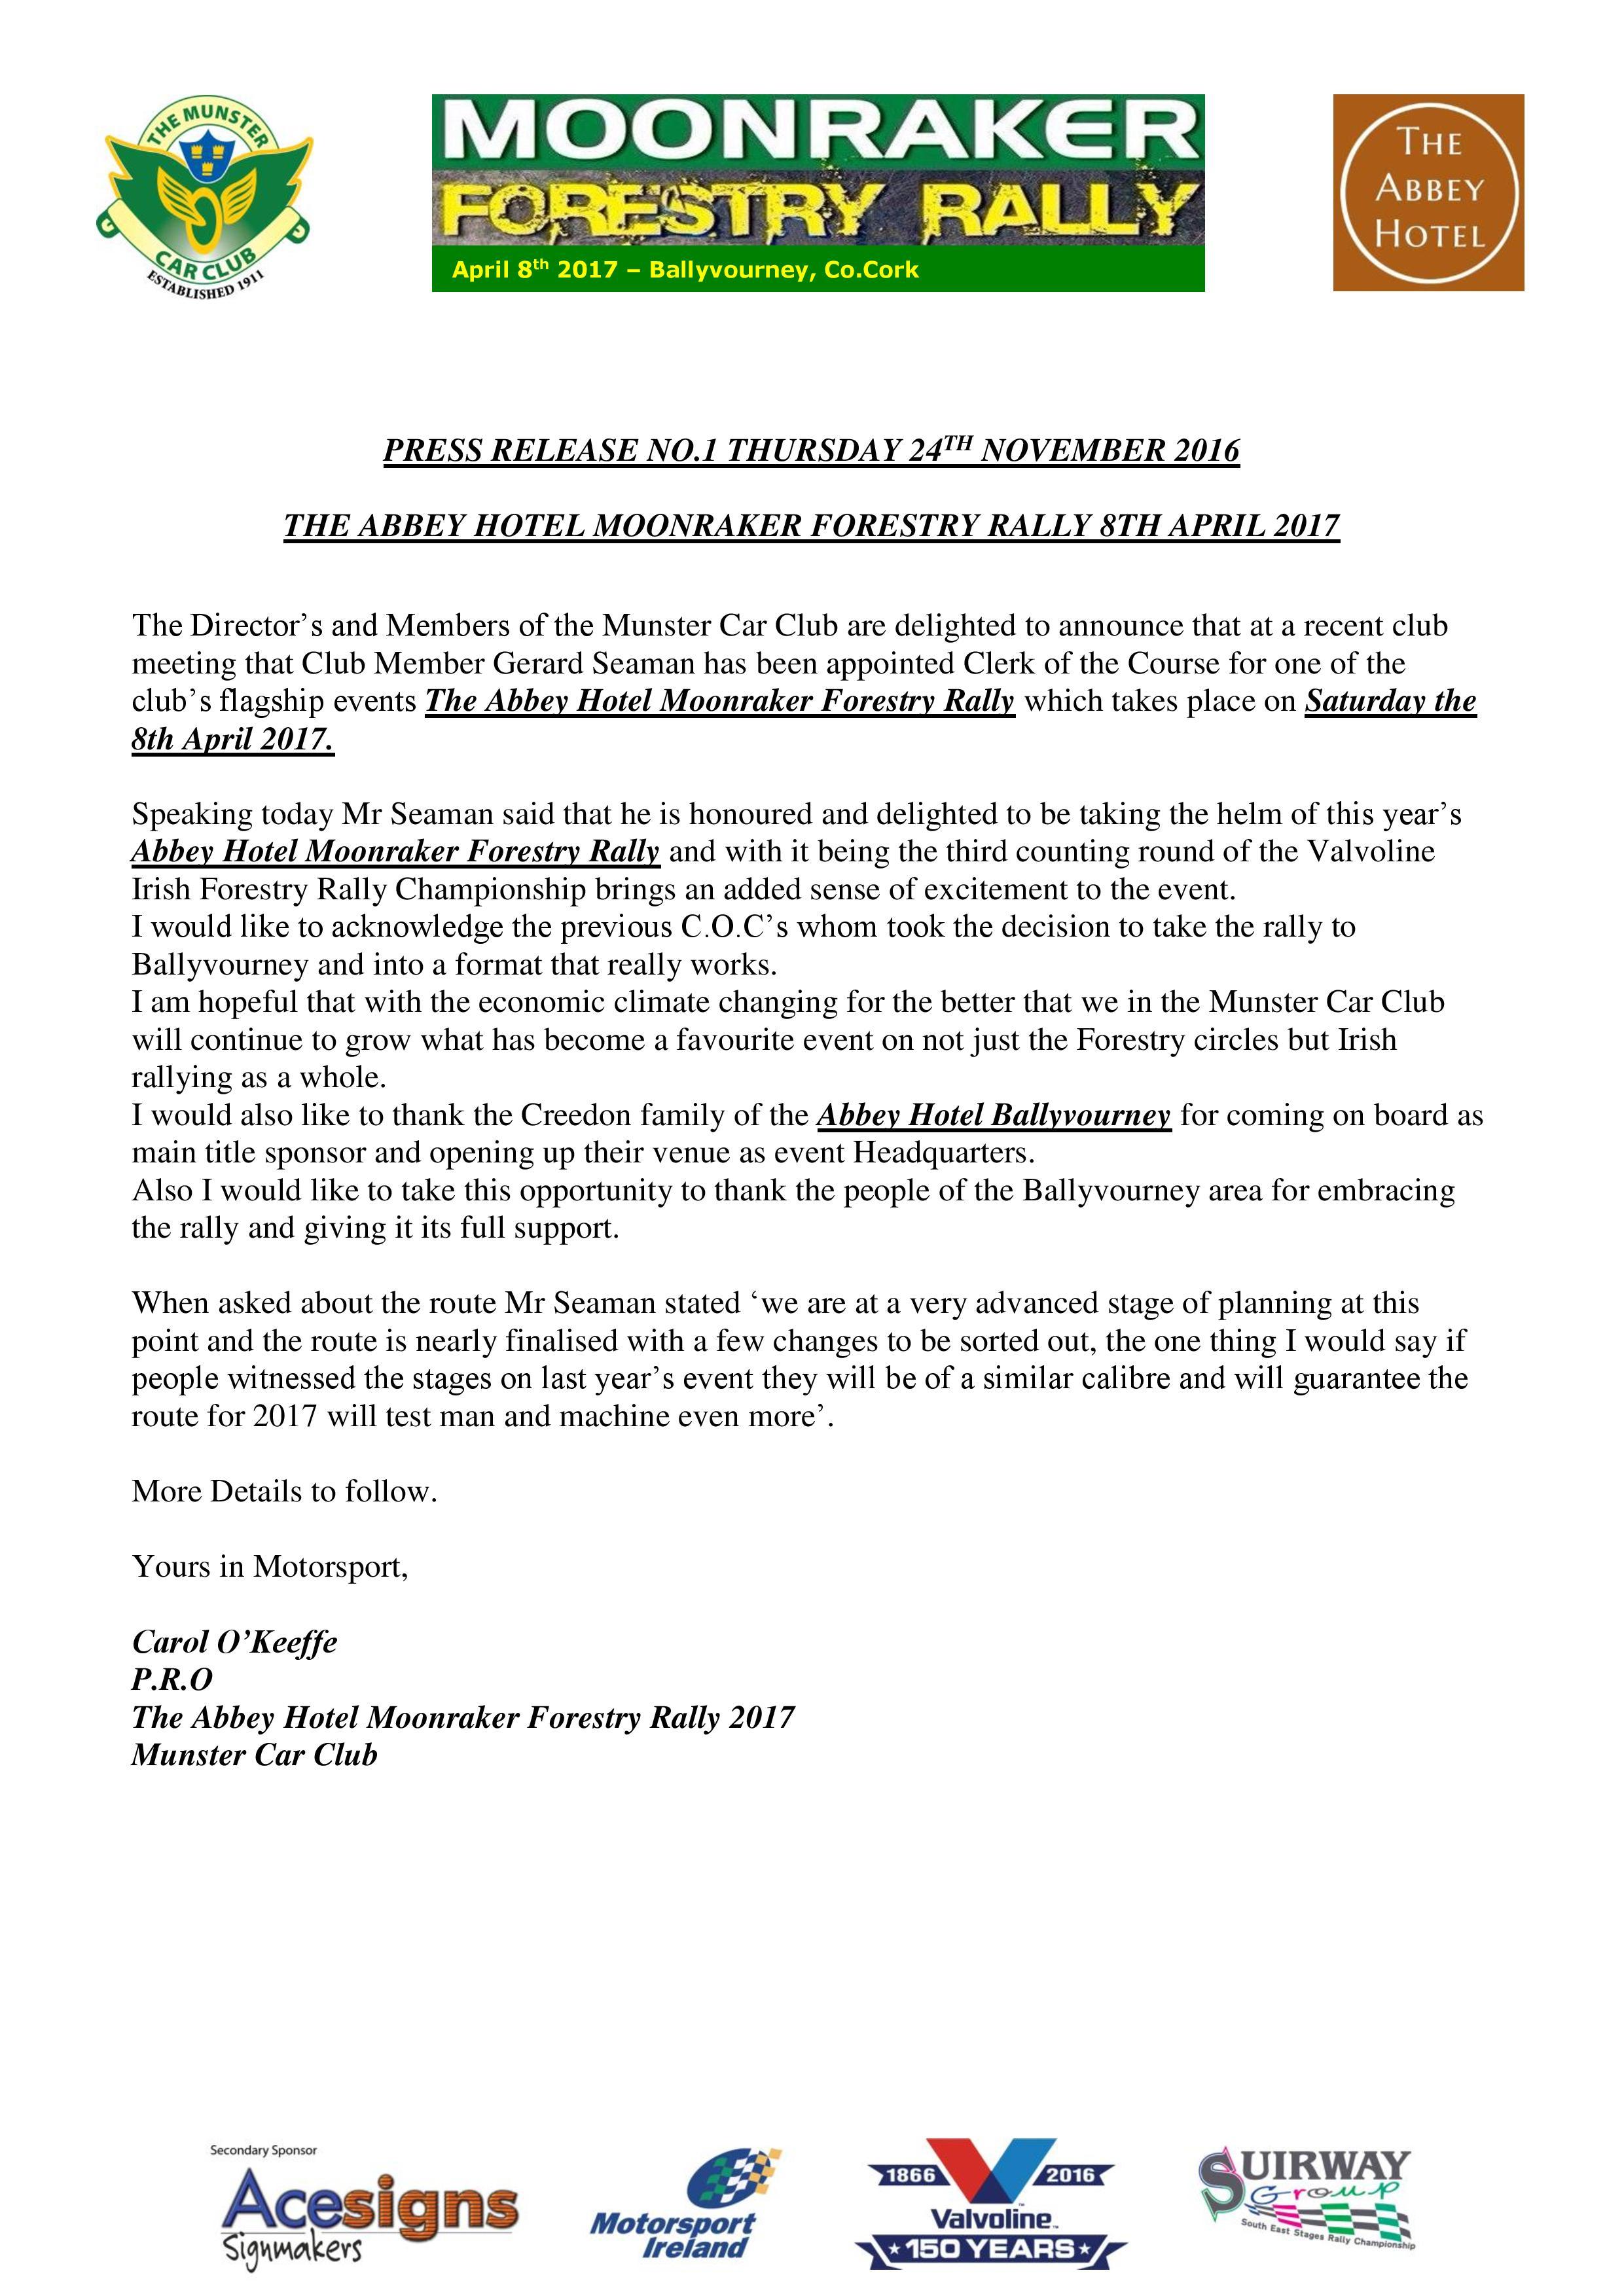 moonraker-2017-press-release-no-1-page-001